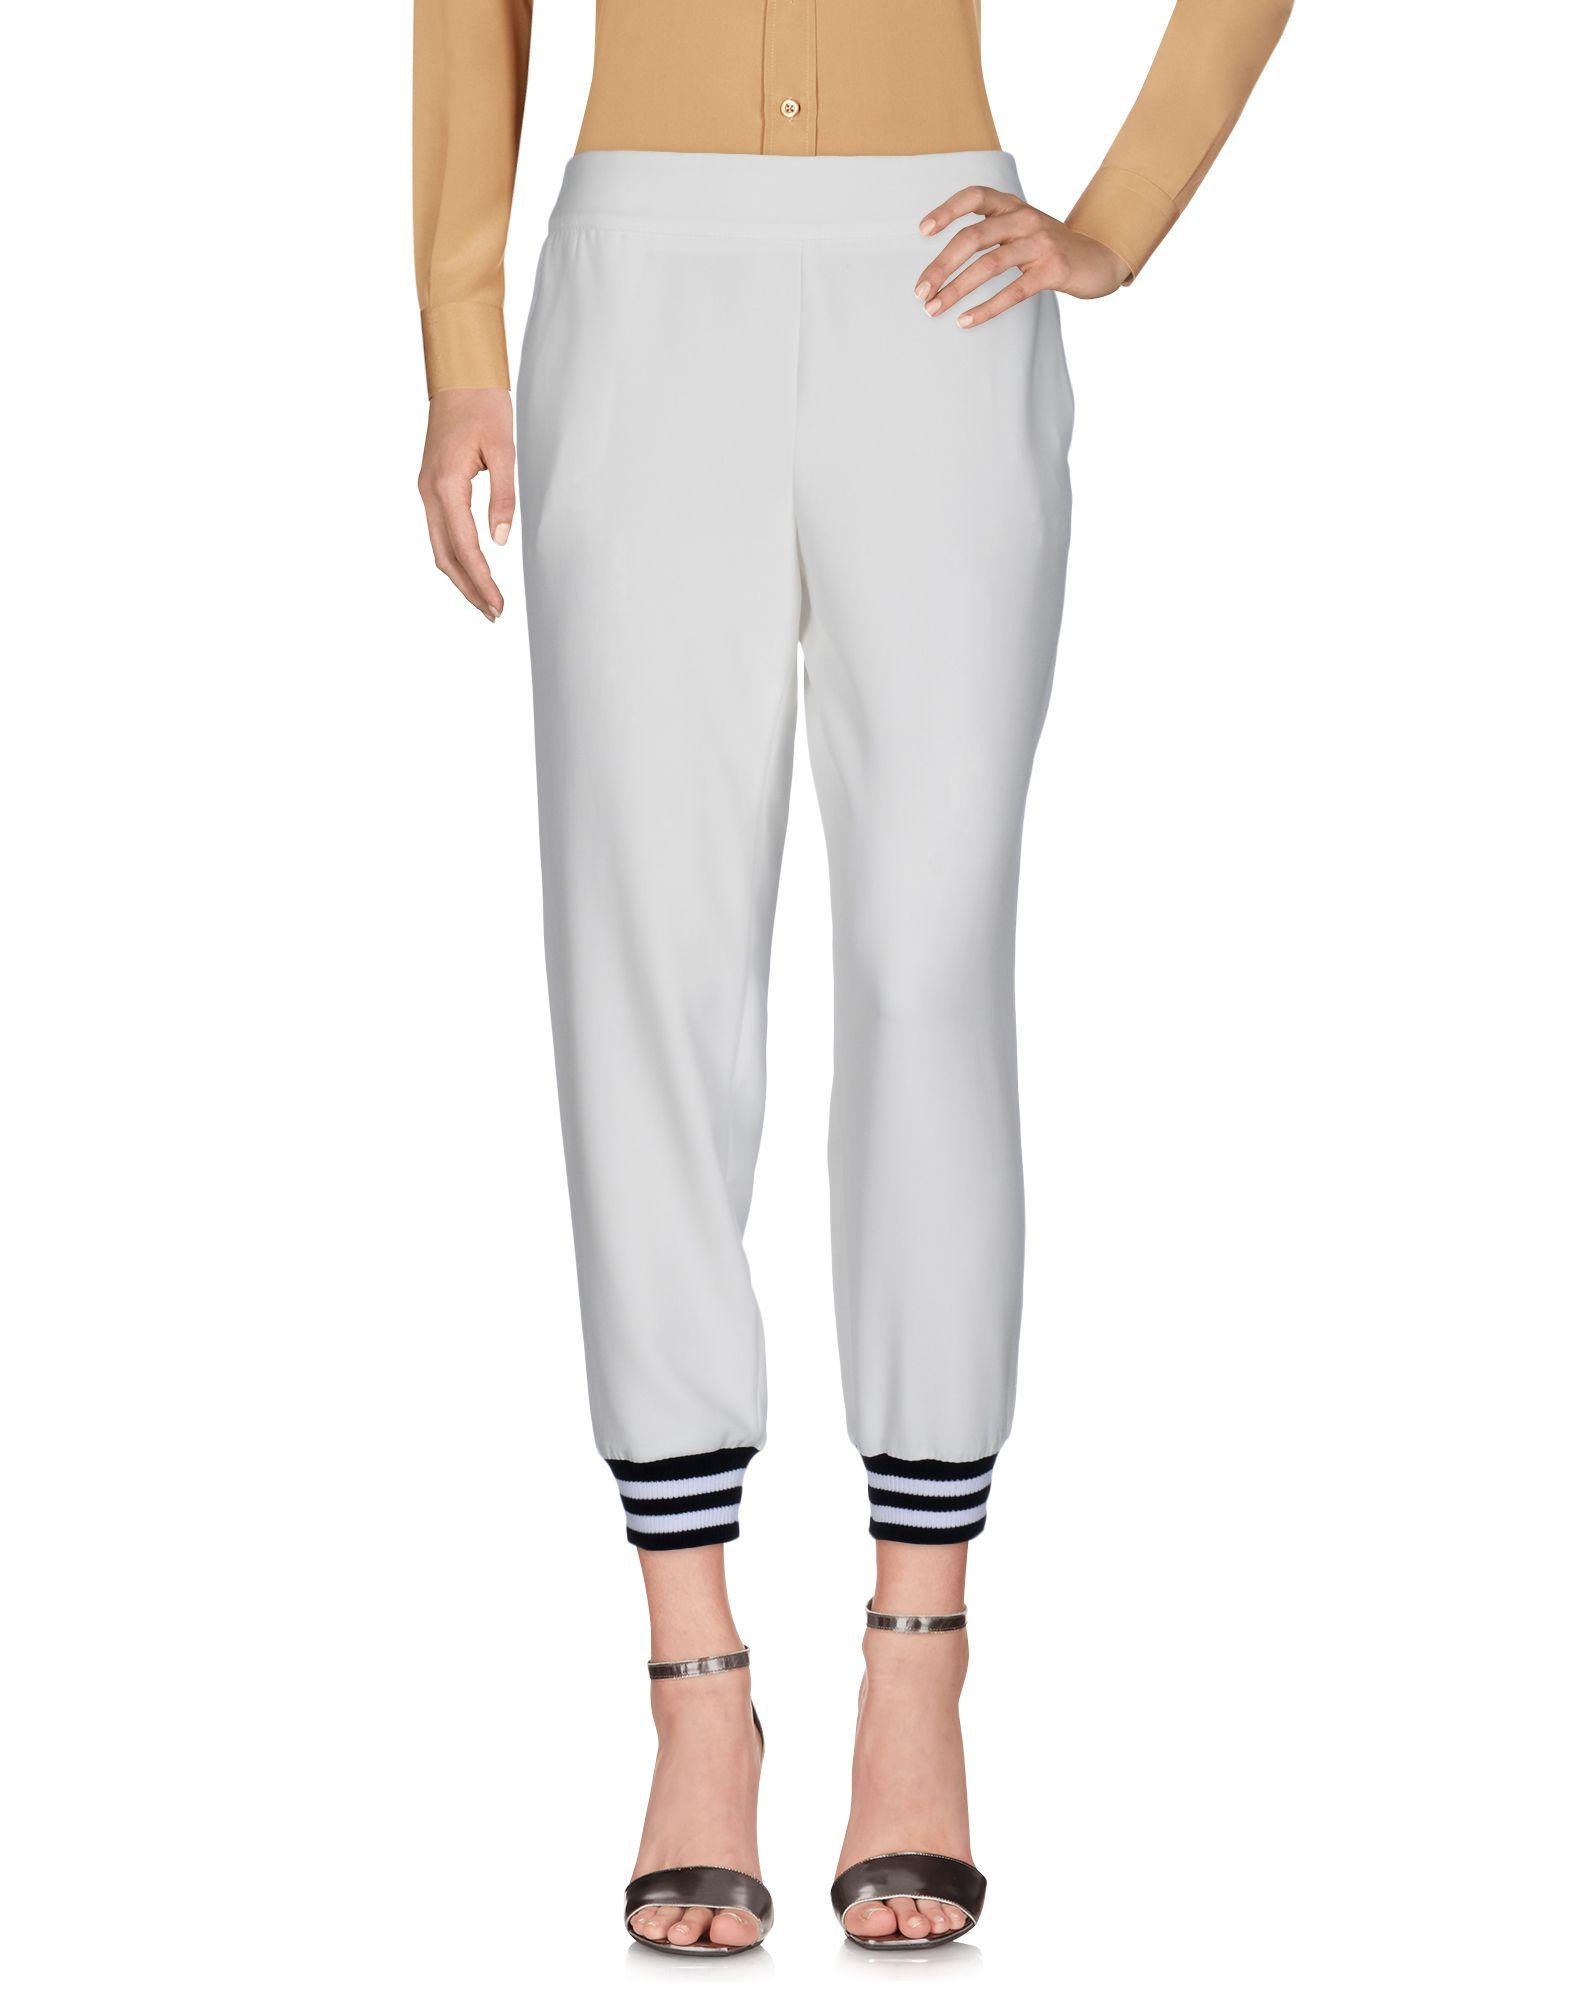 Pantalone Atos Lombardini Donna - Acquista online su FUWCw9mN